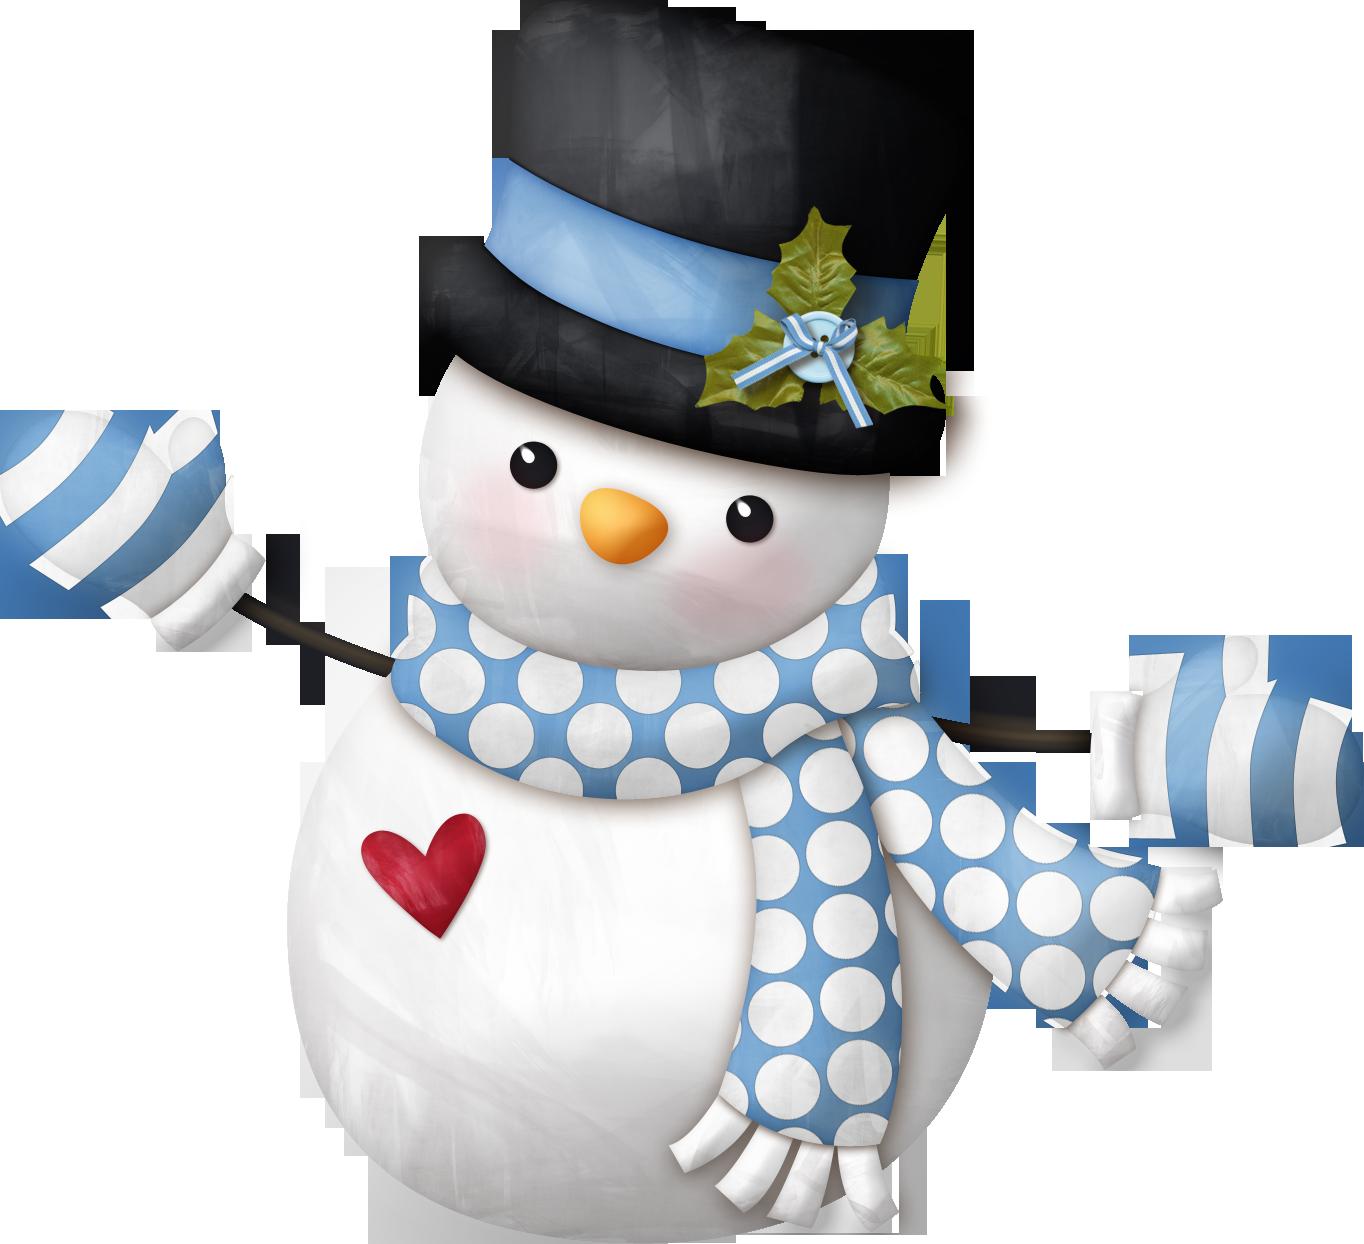 0 C45ea 38e4e8b3 Orig Png 1364 1244 Imagenes De Munecos De Nieve Muneco De Nieve Dibujos De Navidad Faciles